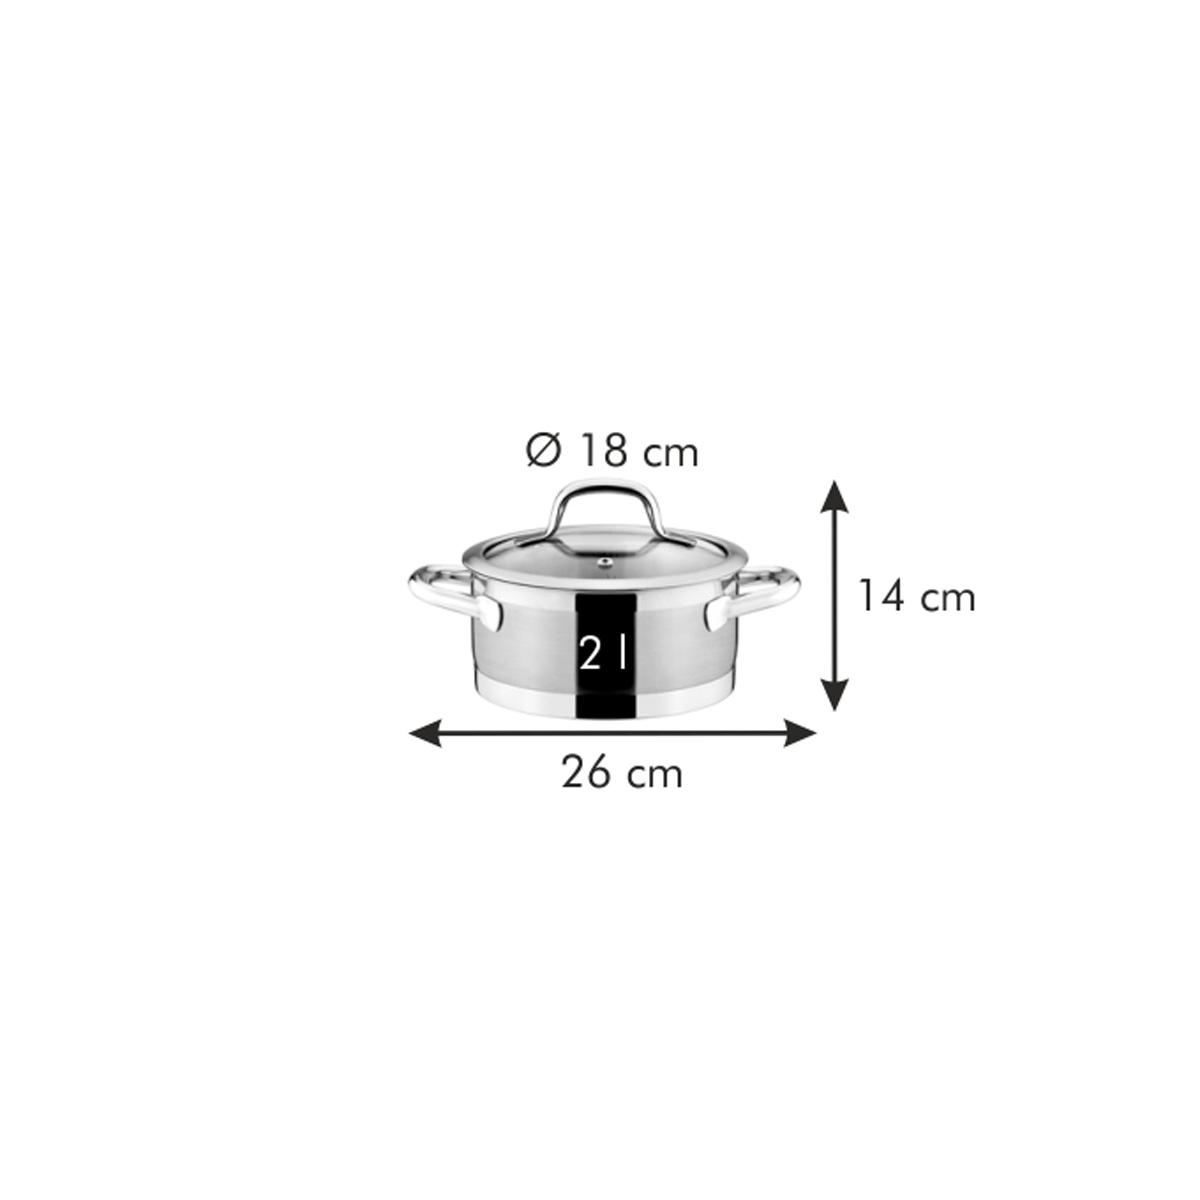 Kastrol PRESIDENT s poklicí ø 18 cm, 2.0 l